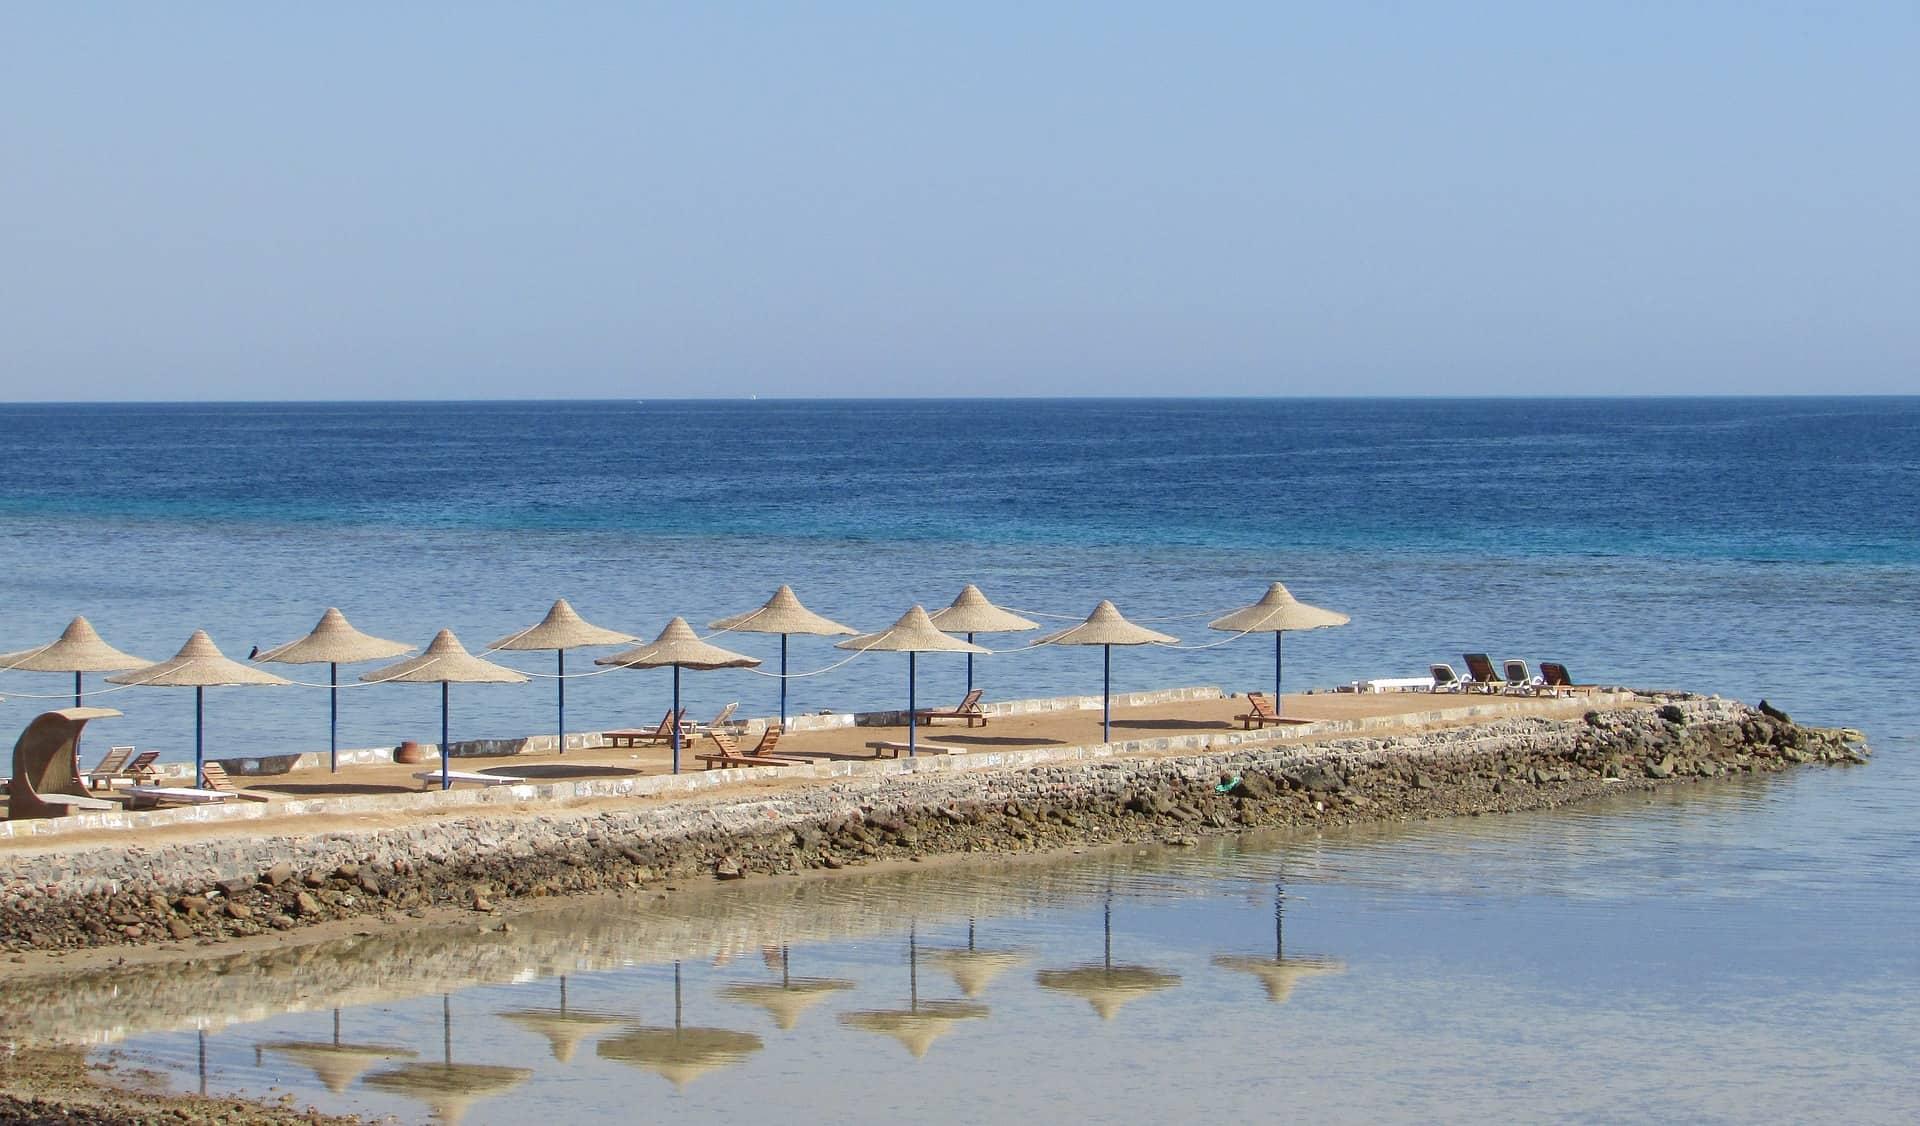 Hurghada Urlaub Last Minute Deals zum Bestpreis